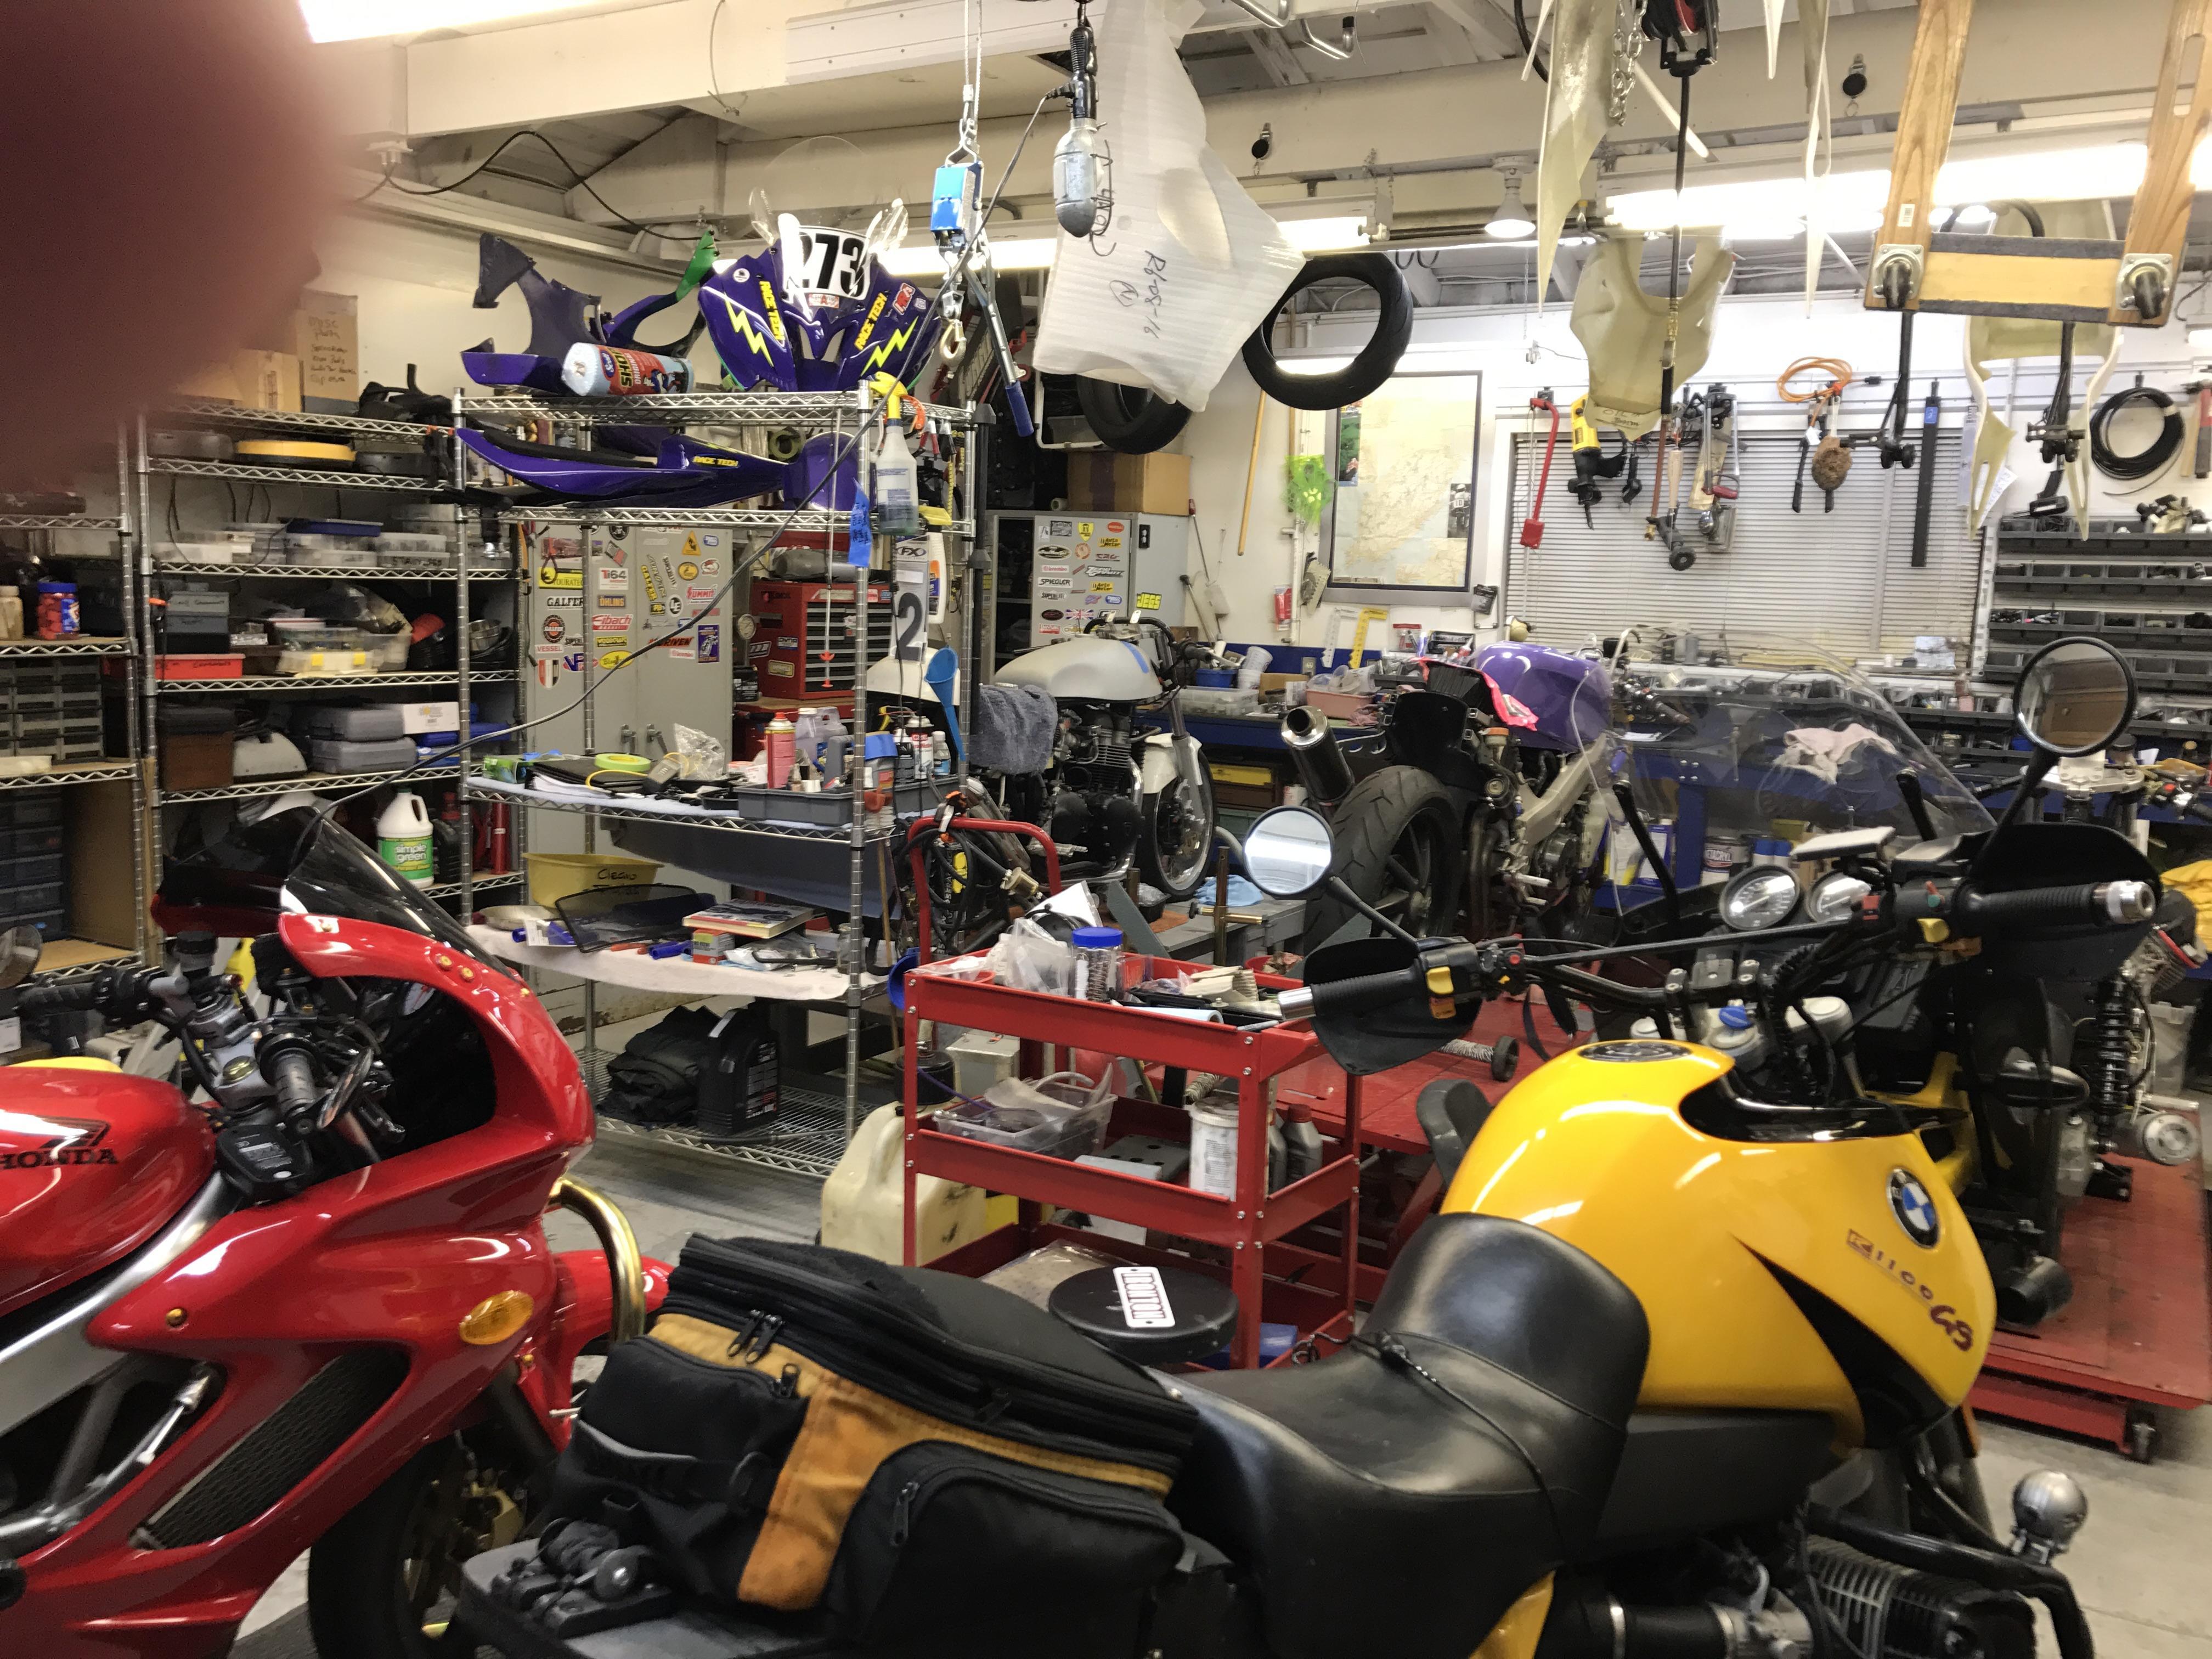 Iom Bike Help Technical Topics Moto Guzzi Forum Ducati St3s Wiring Diagram 2017 11 2620170403